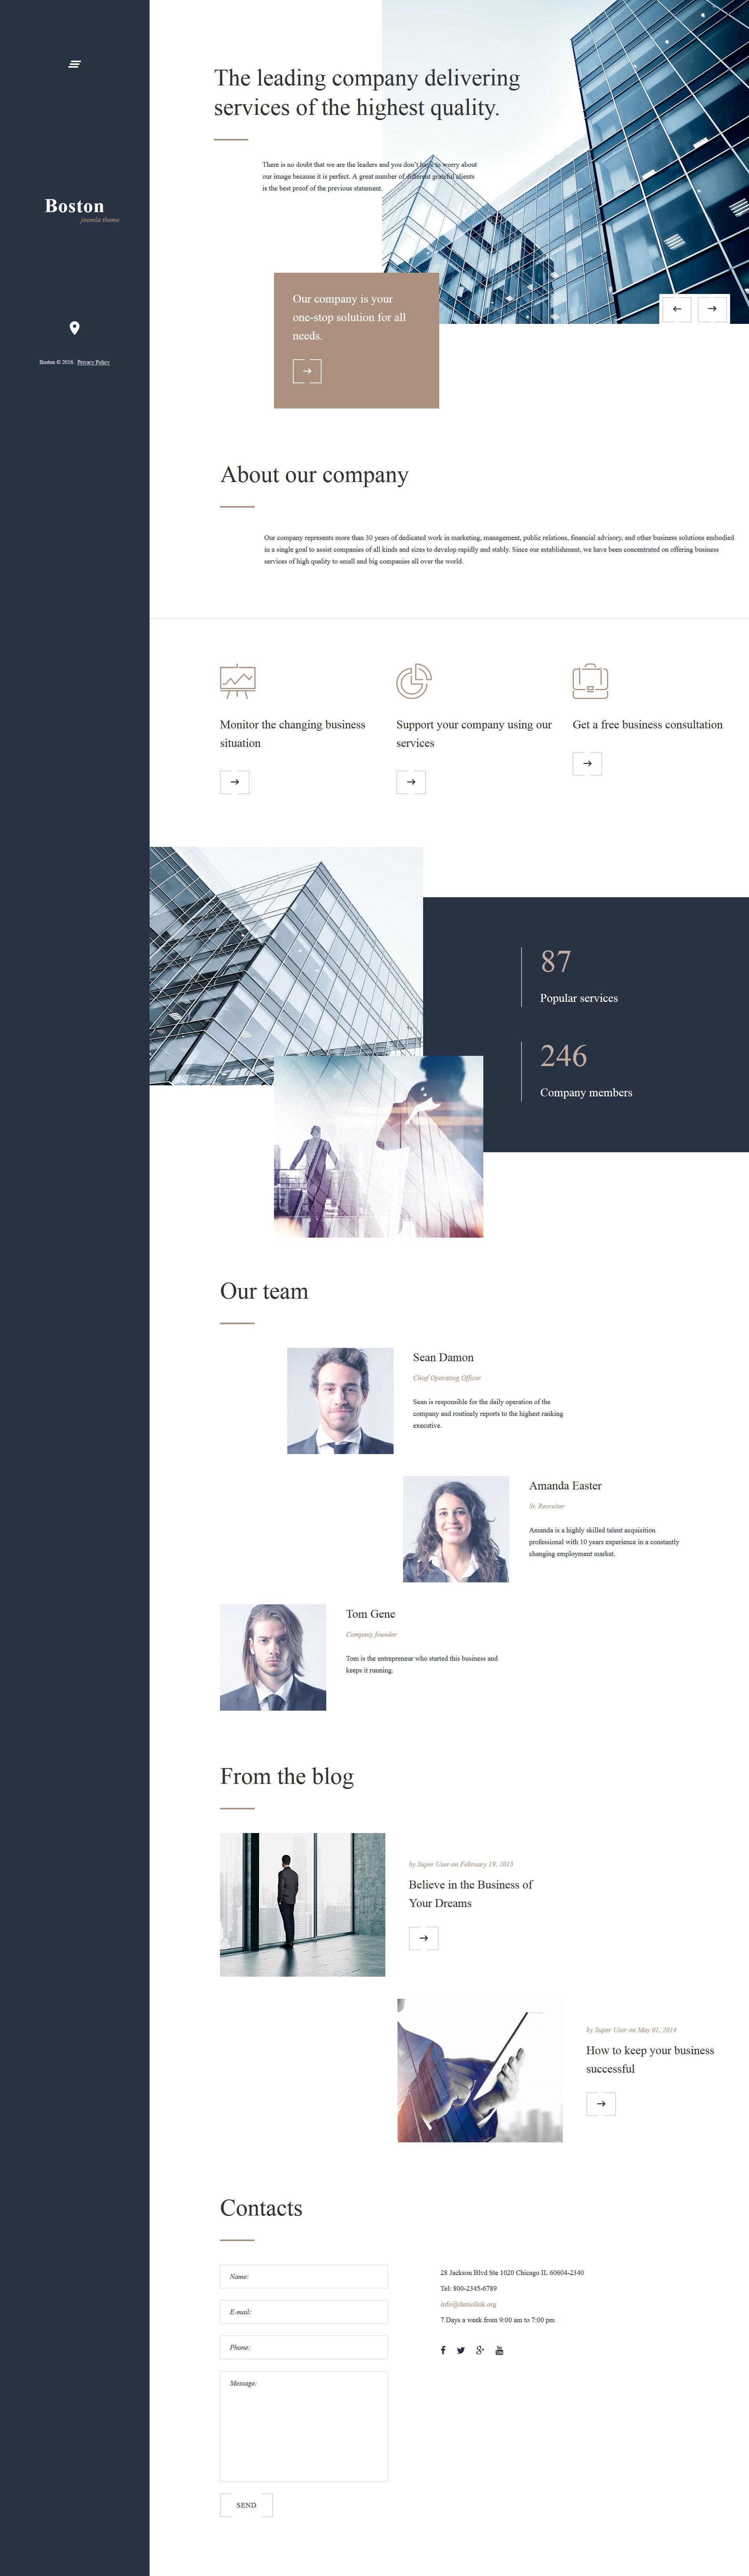 Boston Joomla Template - screenshot